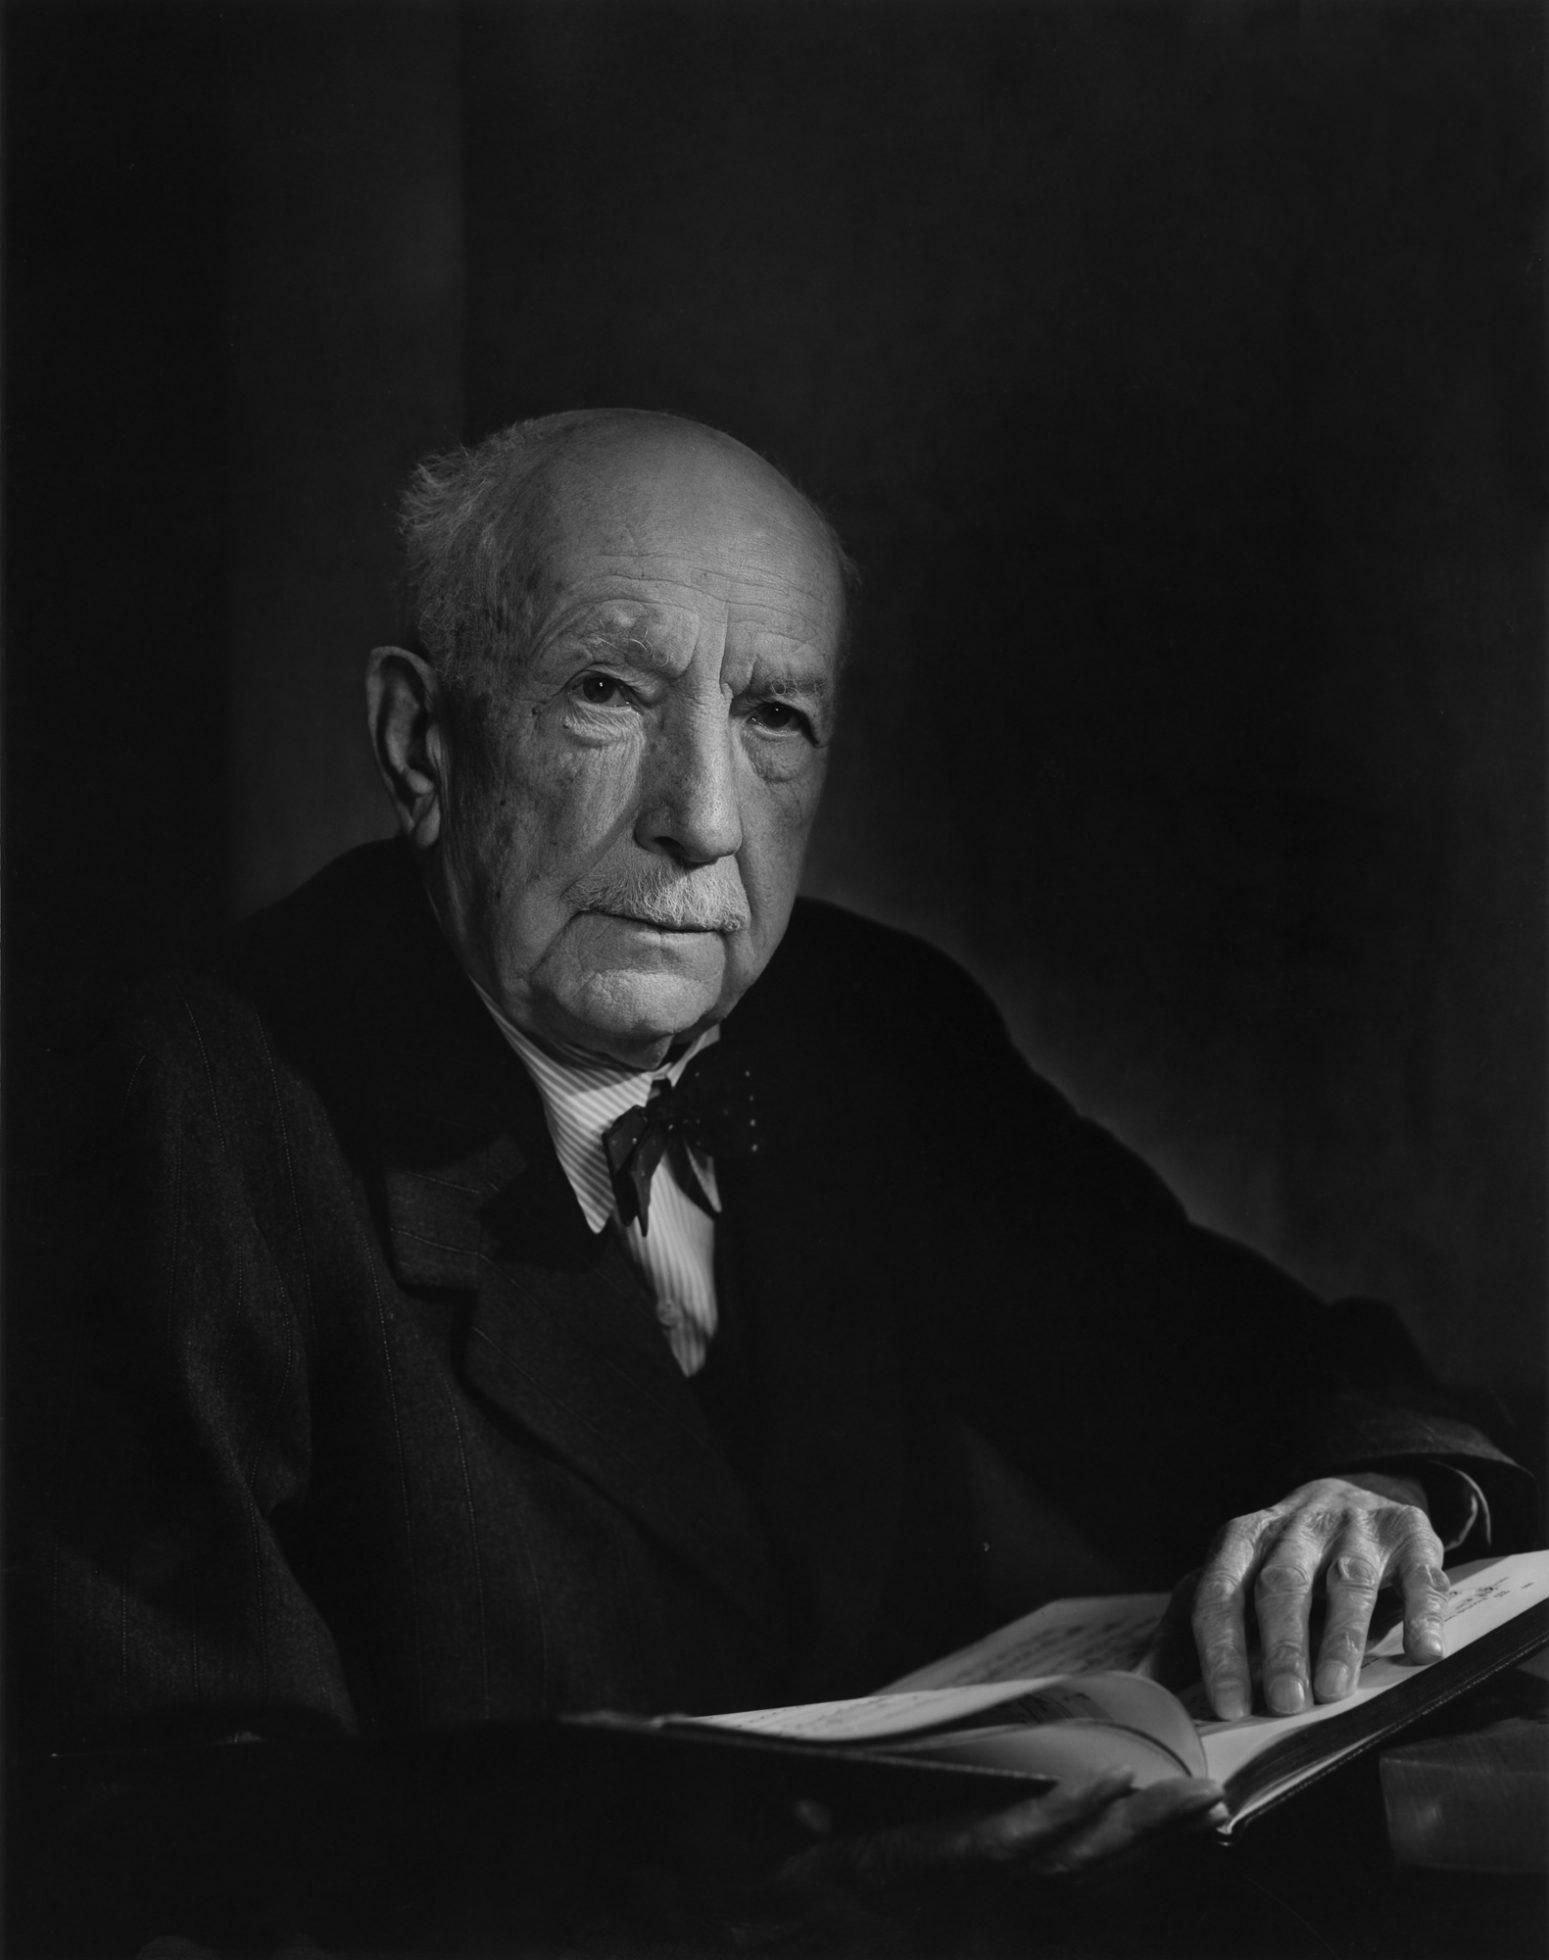 Fotó: Yousuf Karsh: Richard Strauss, 1949 © Yousuf Karsh